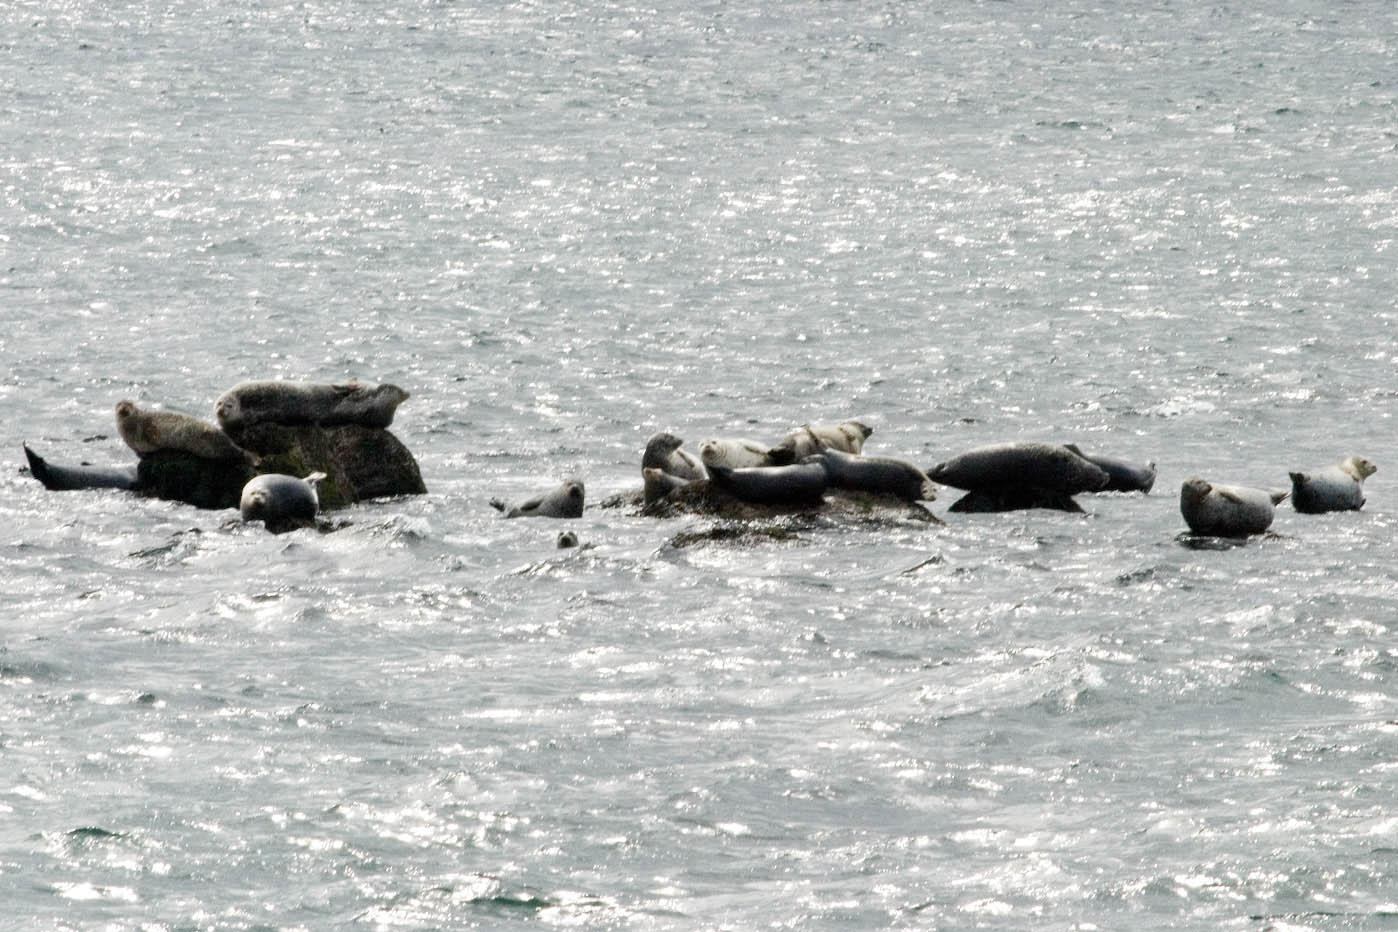 Harp seals around rocks in the sea